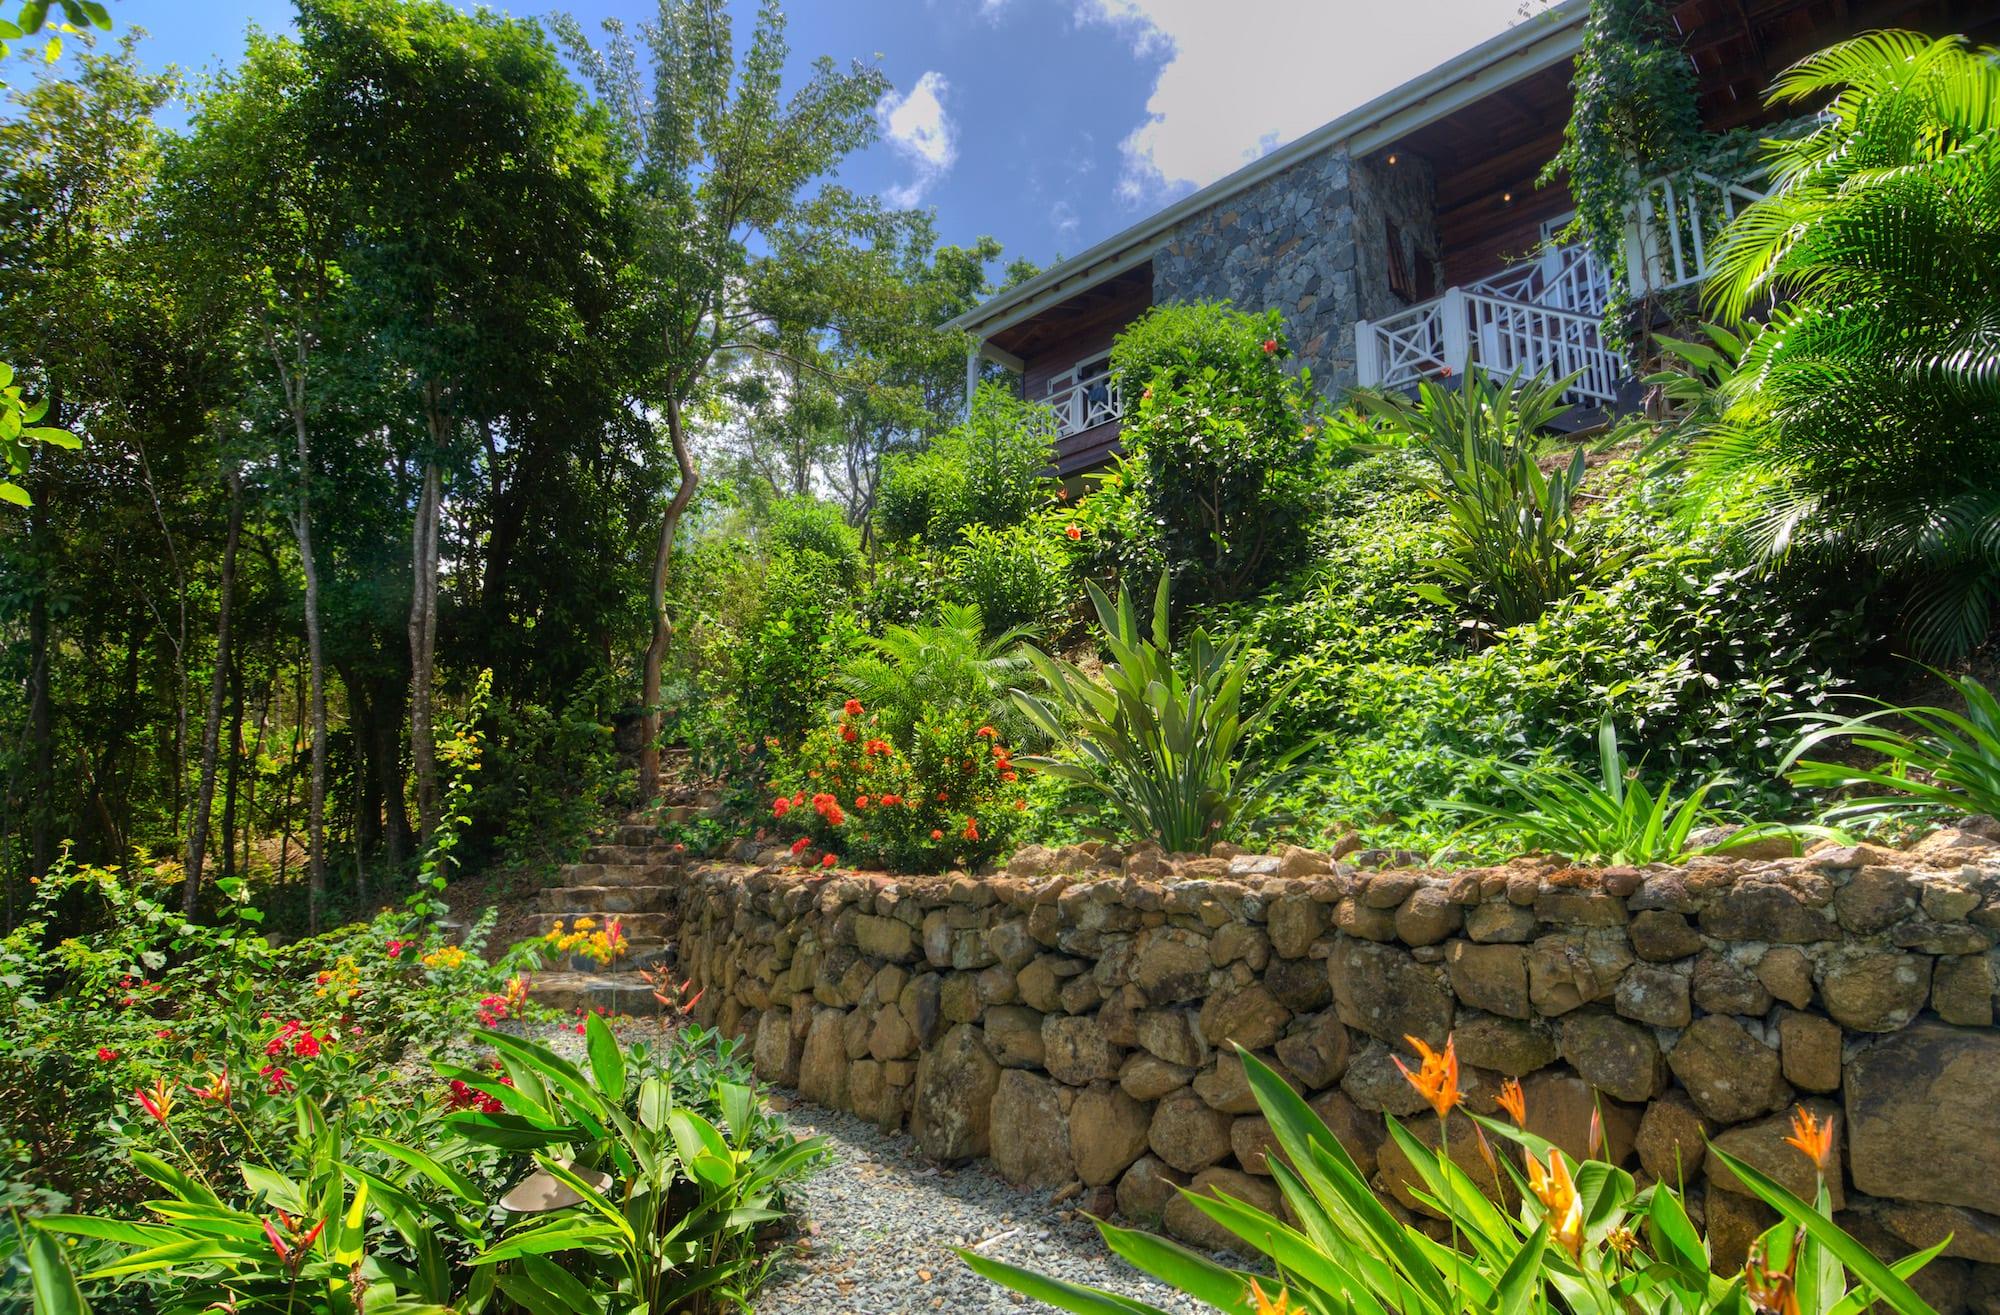 property image # 1